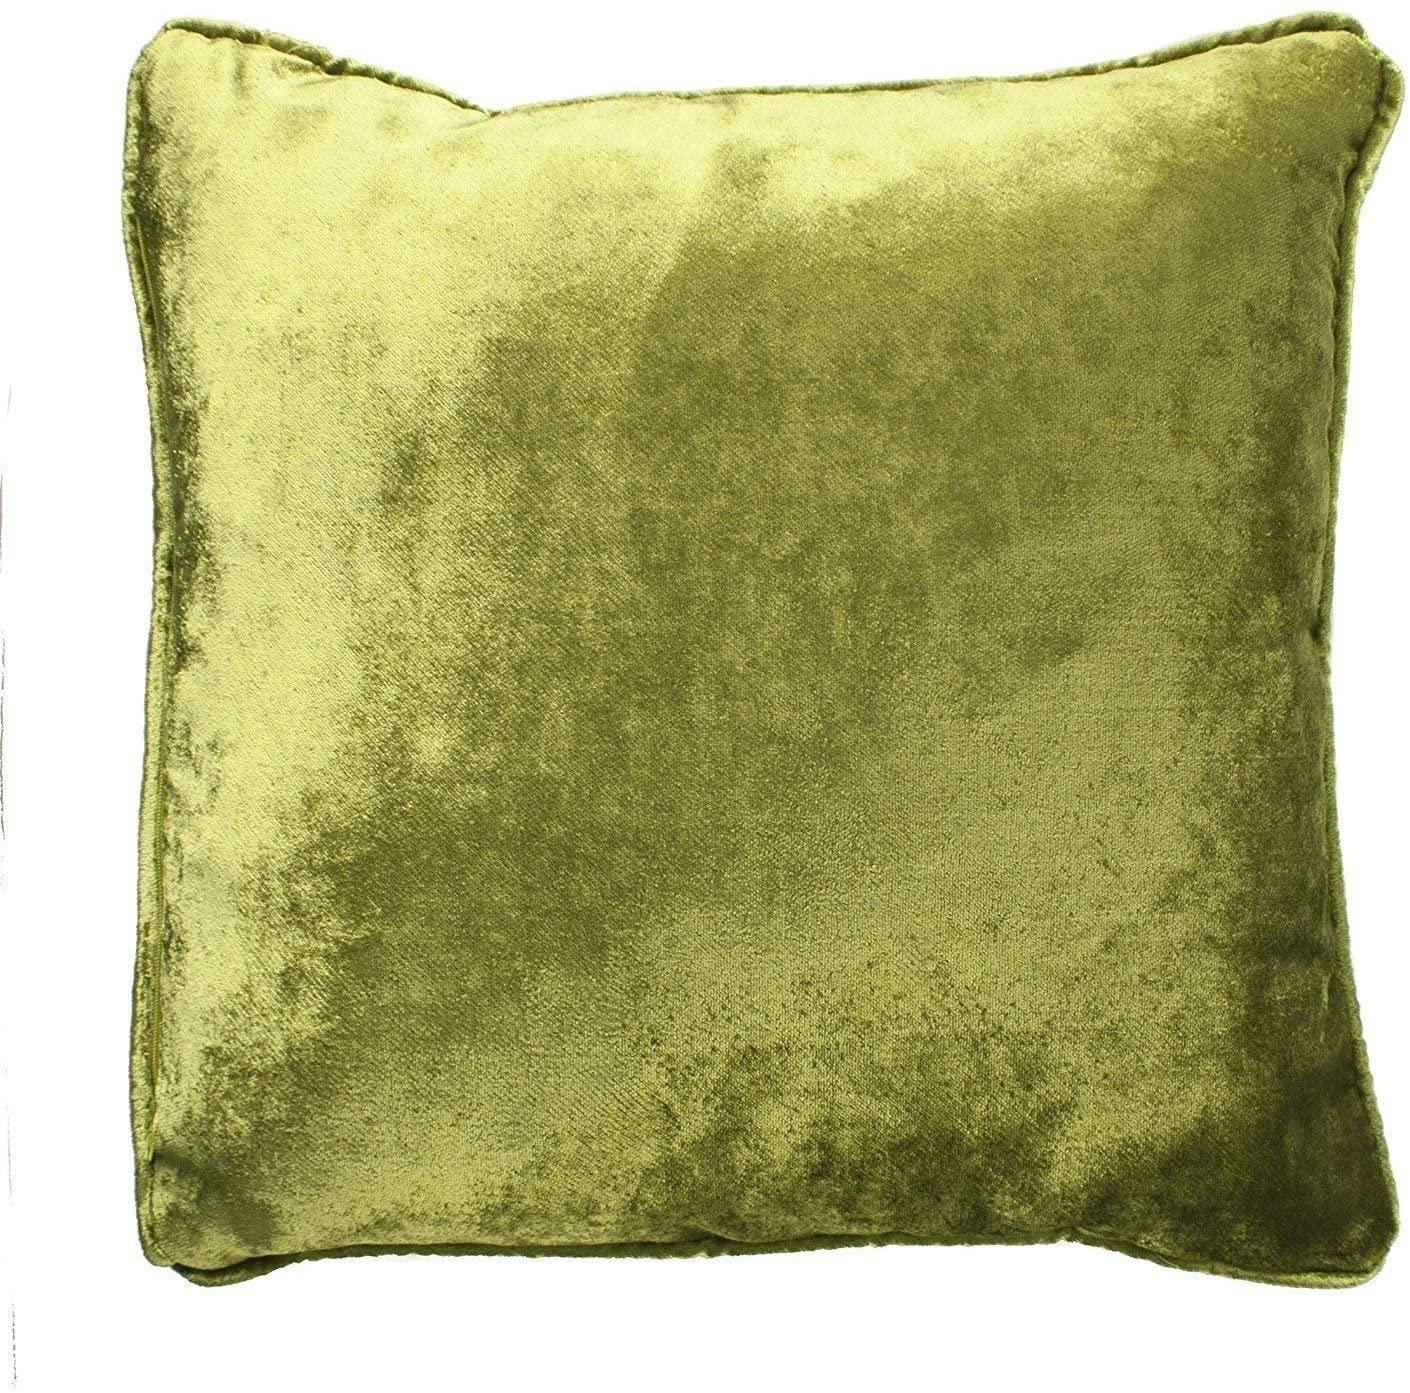 McAlister Textiles Shiny Velvet | Pillow Cover Sham in Aubergine Purple | Lumbar 12 x 18 Inches | Plump Decorative Toss Cushion Case Crushed Metallic Look Modern Plush Decor